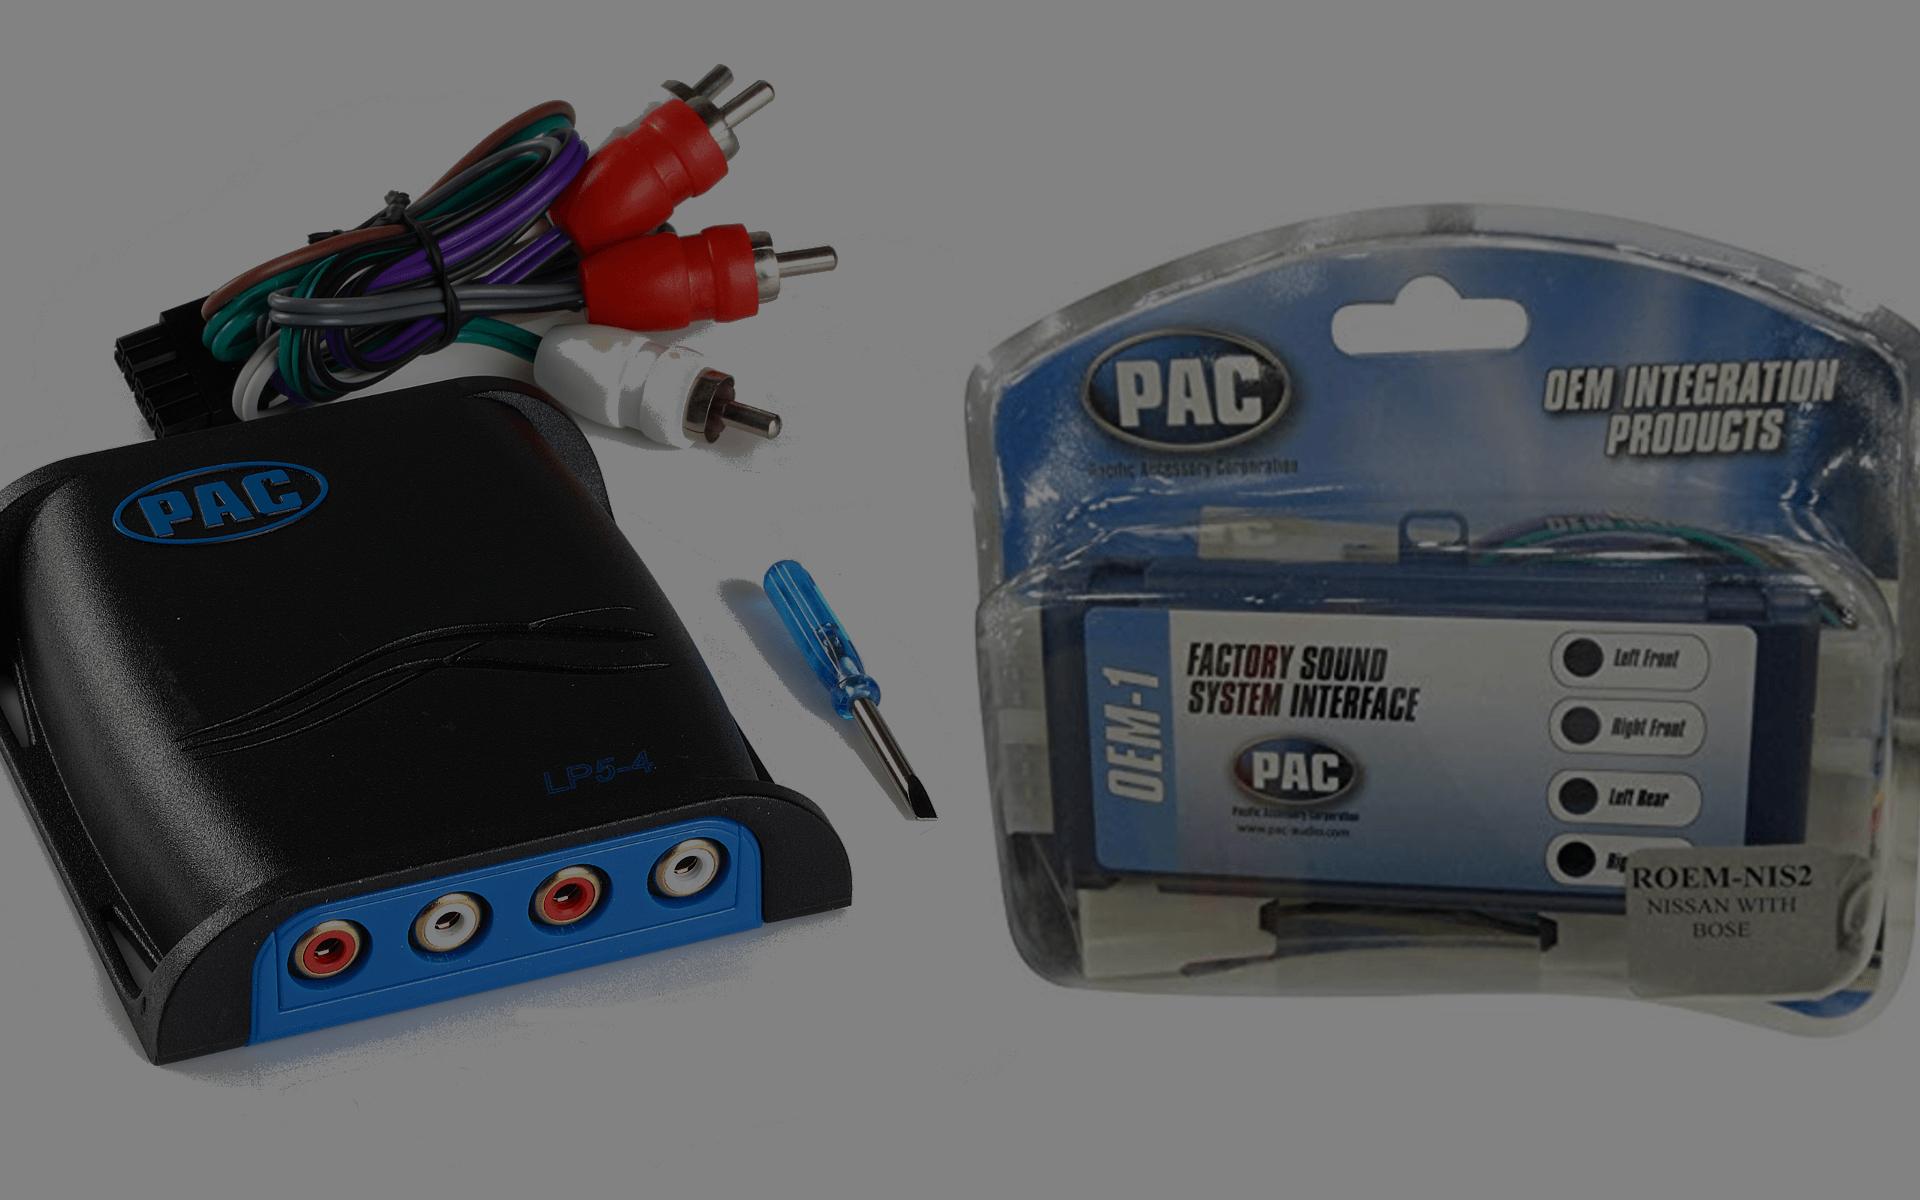 Nissan Bose Amplifier Workshop 12 Pac Rca Converter Wiring Diagram